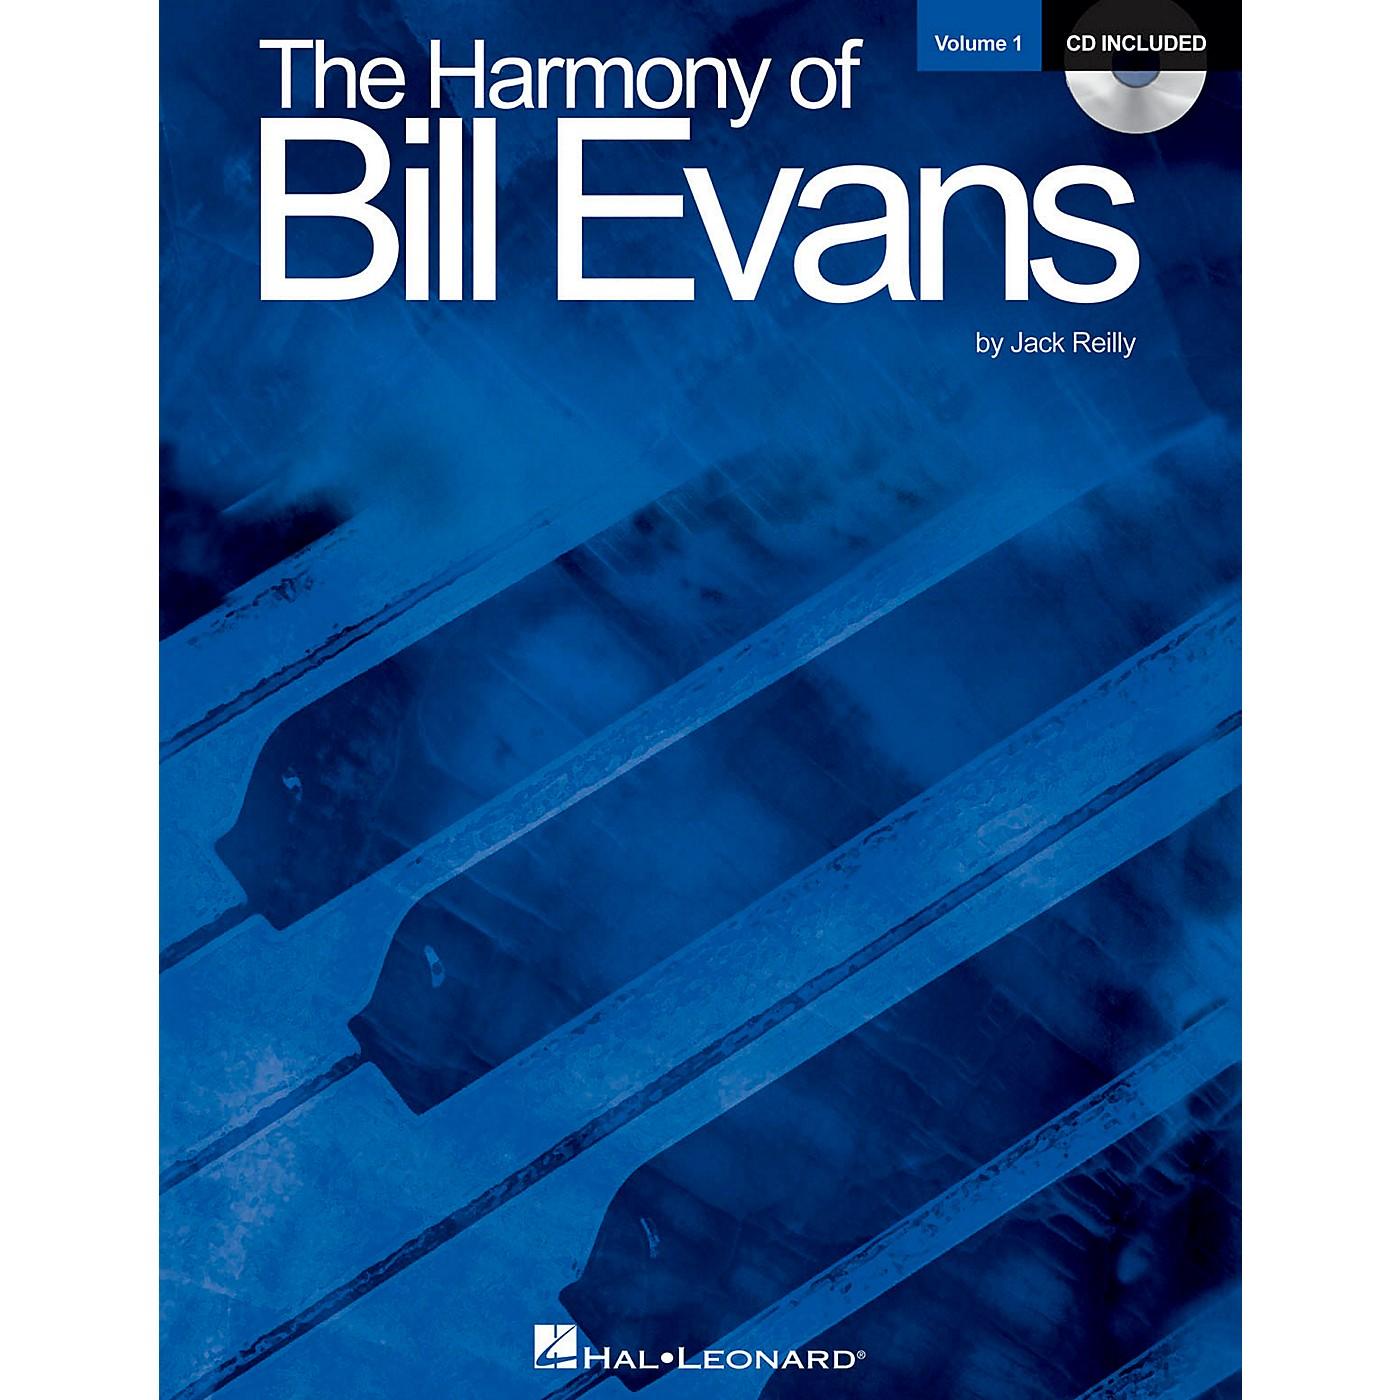 Hal Leonard Harmony Of Bill Evans - Volume 1 (Book/CD Edition) thumbnail